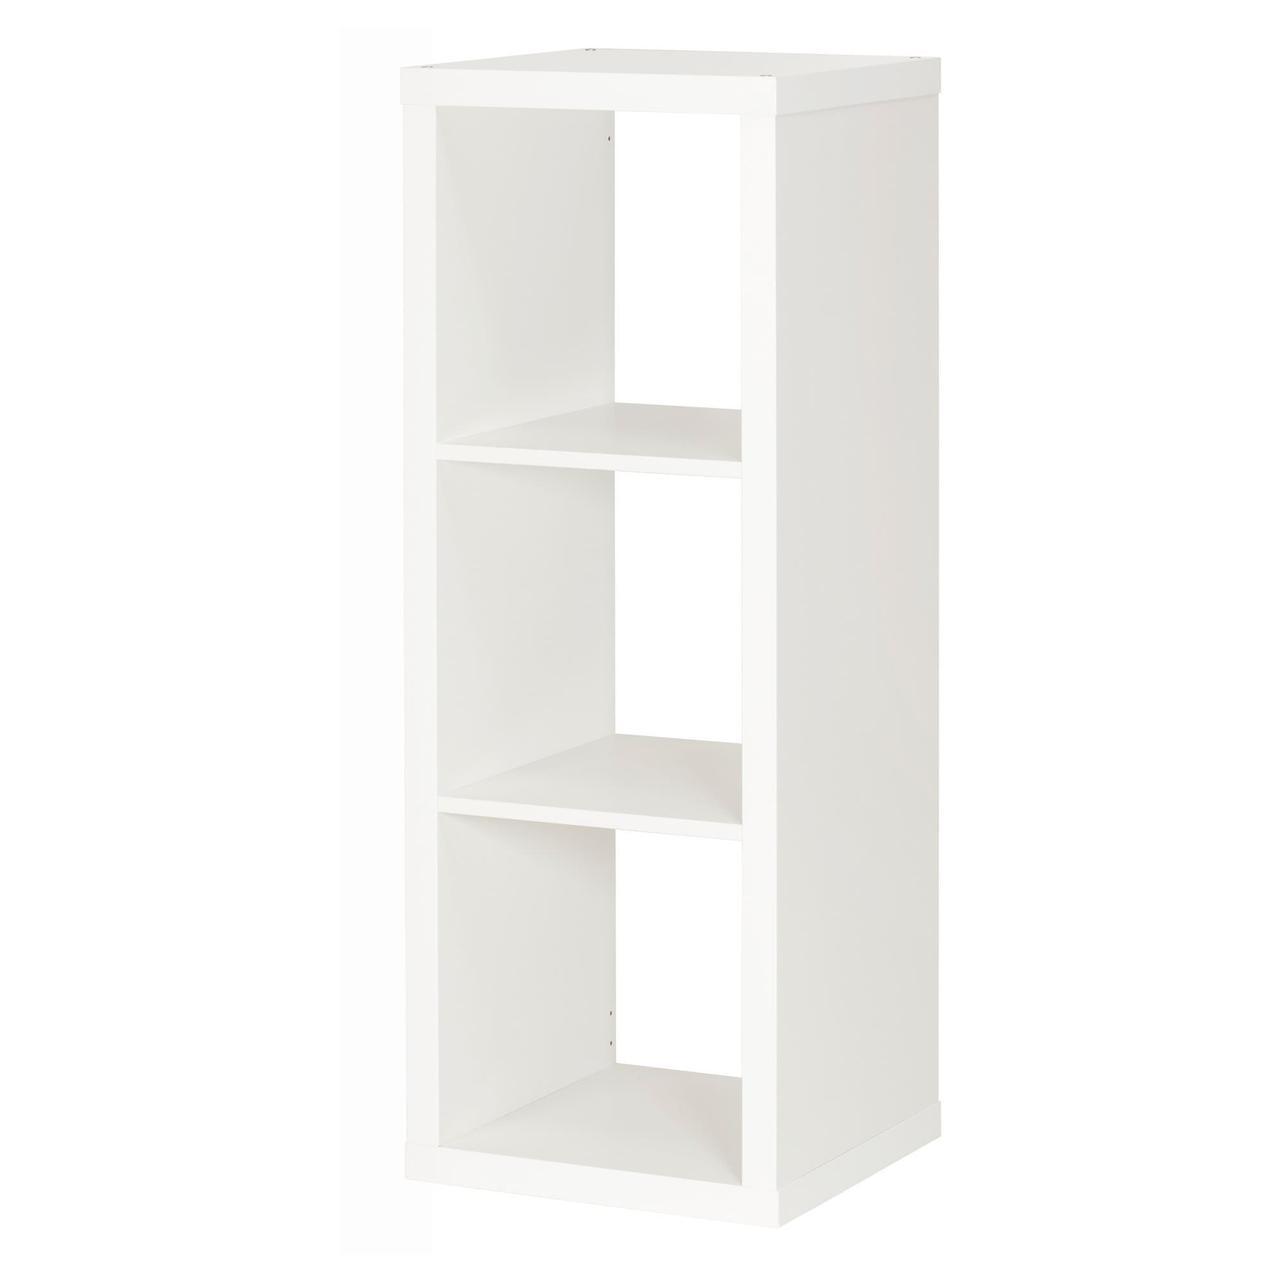 Стеллаж IKEA KALLAX 42x112 см белый 303.721.88